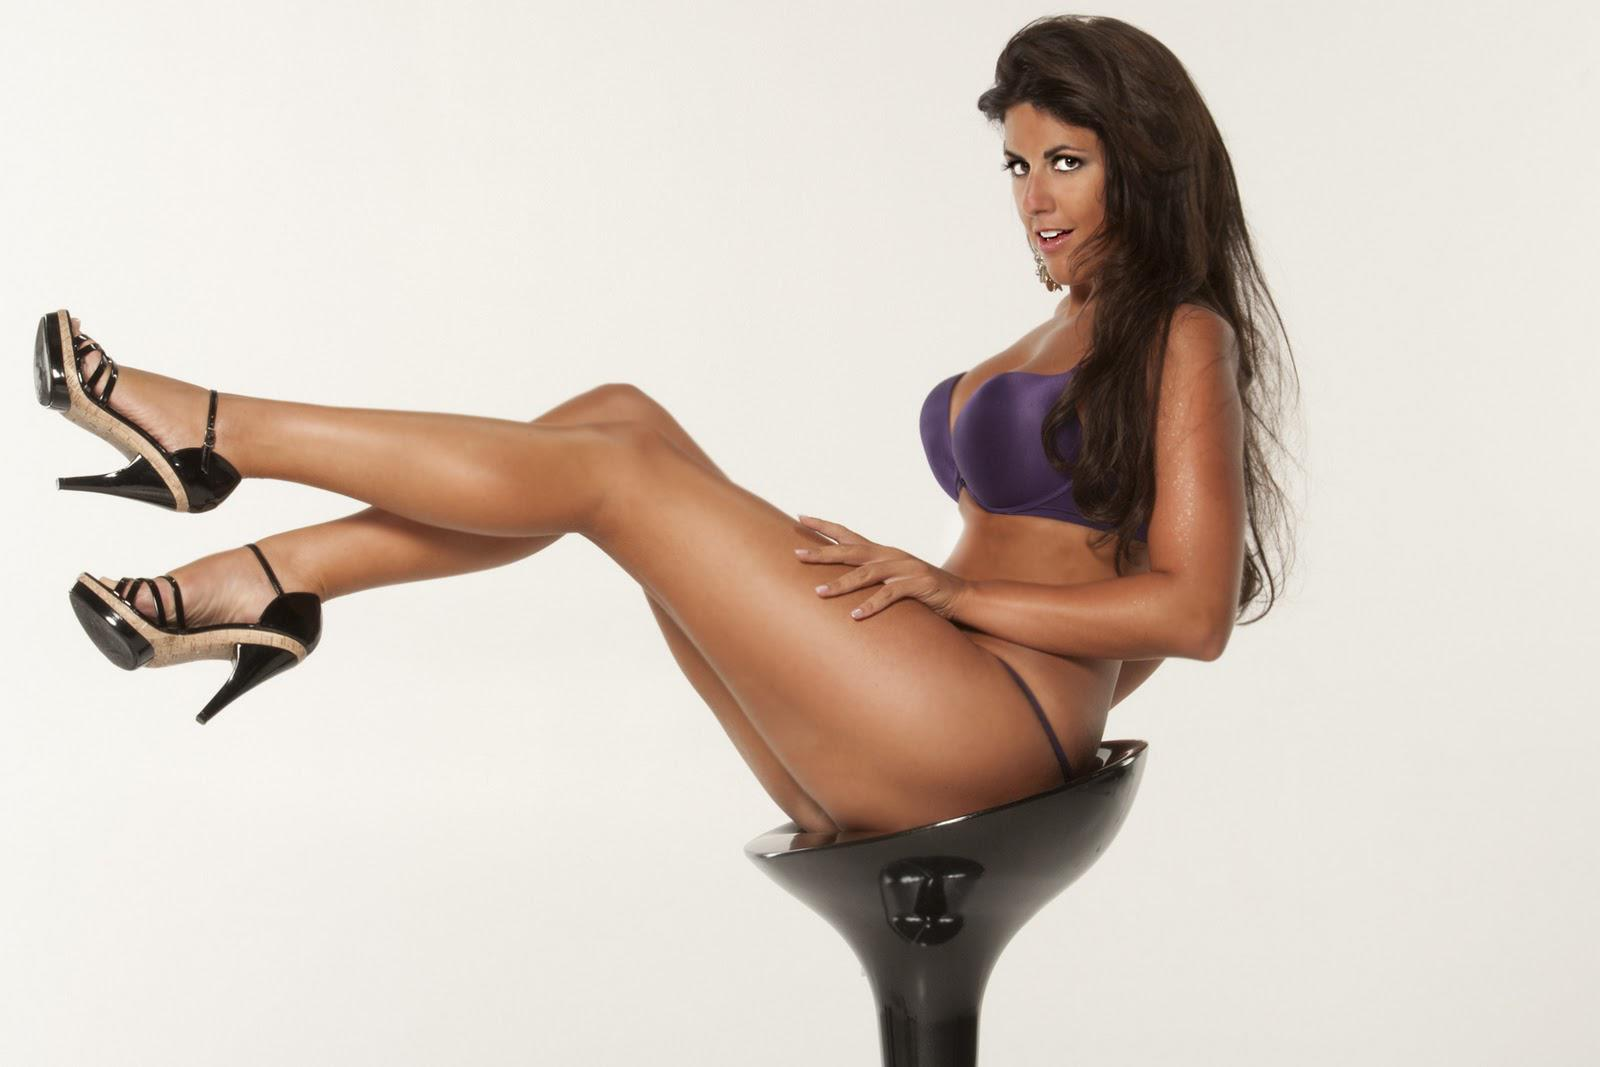 Claudia Romani desnuda sin censura